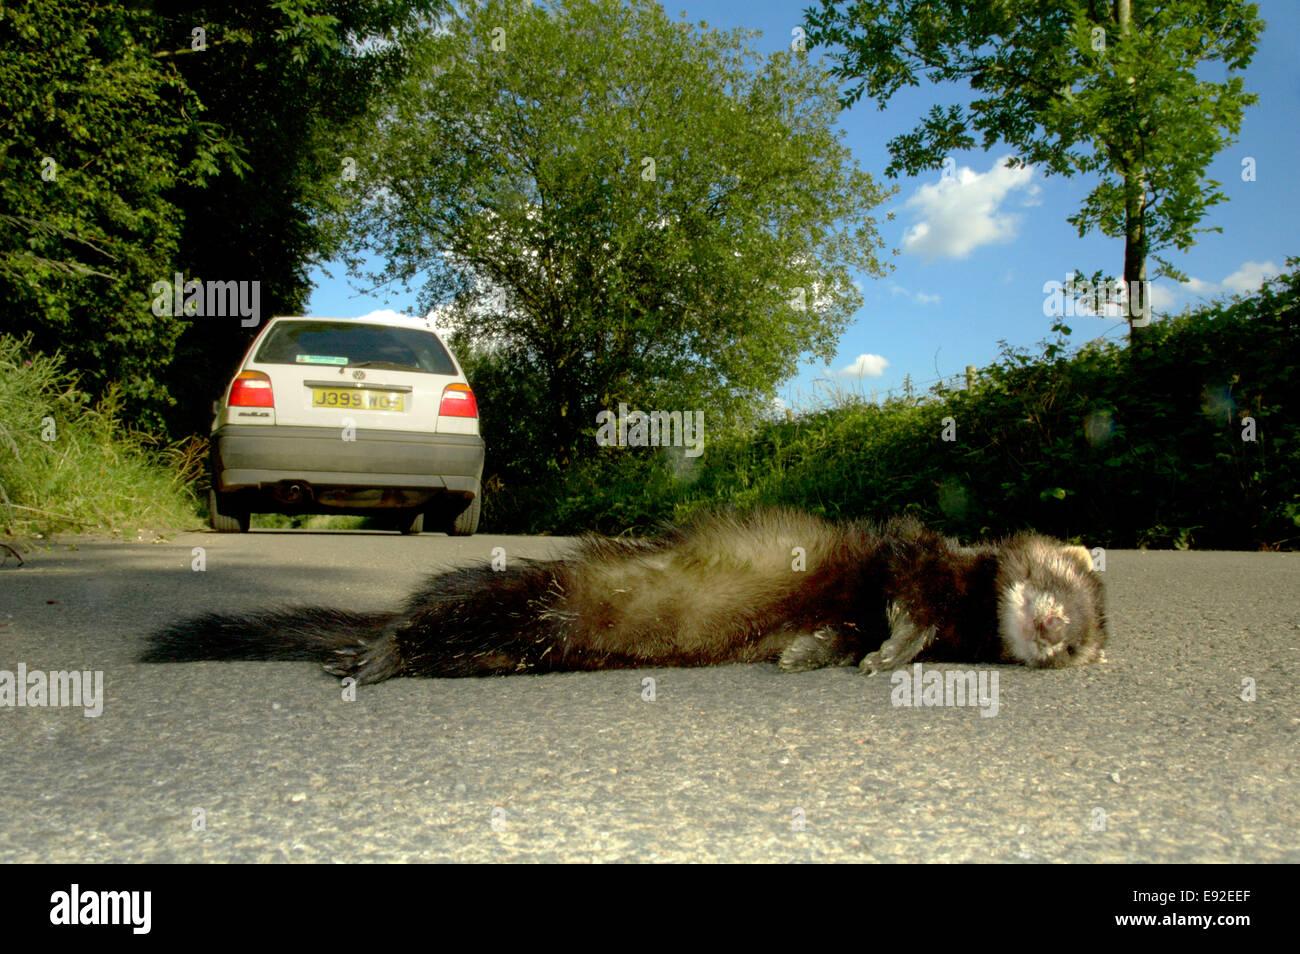 Iltis Straße Unfall - Mustela putorius Stockbild